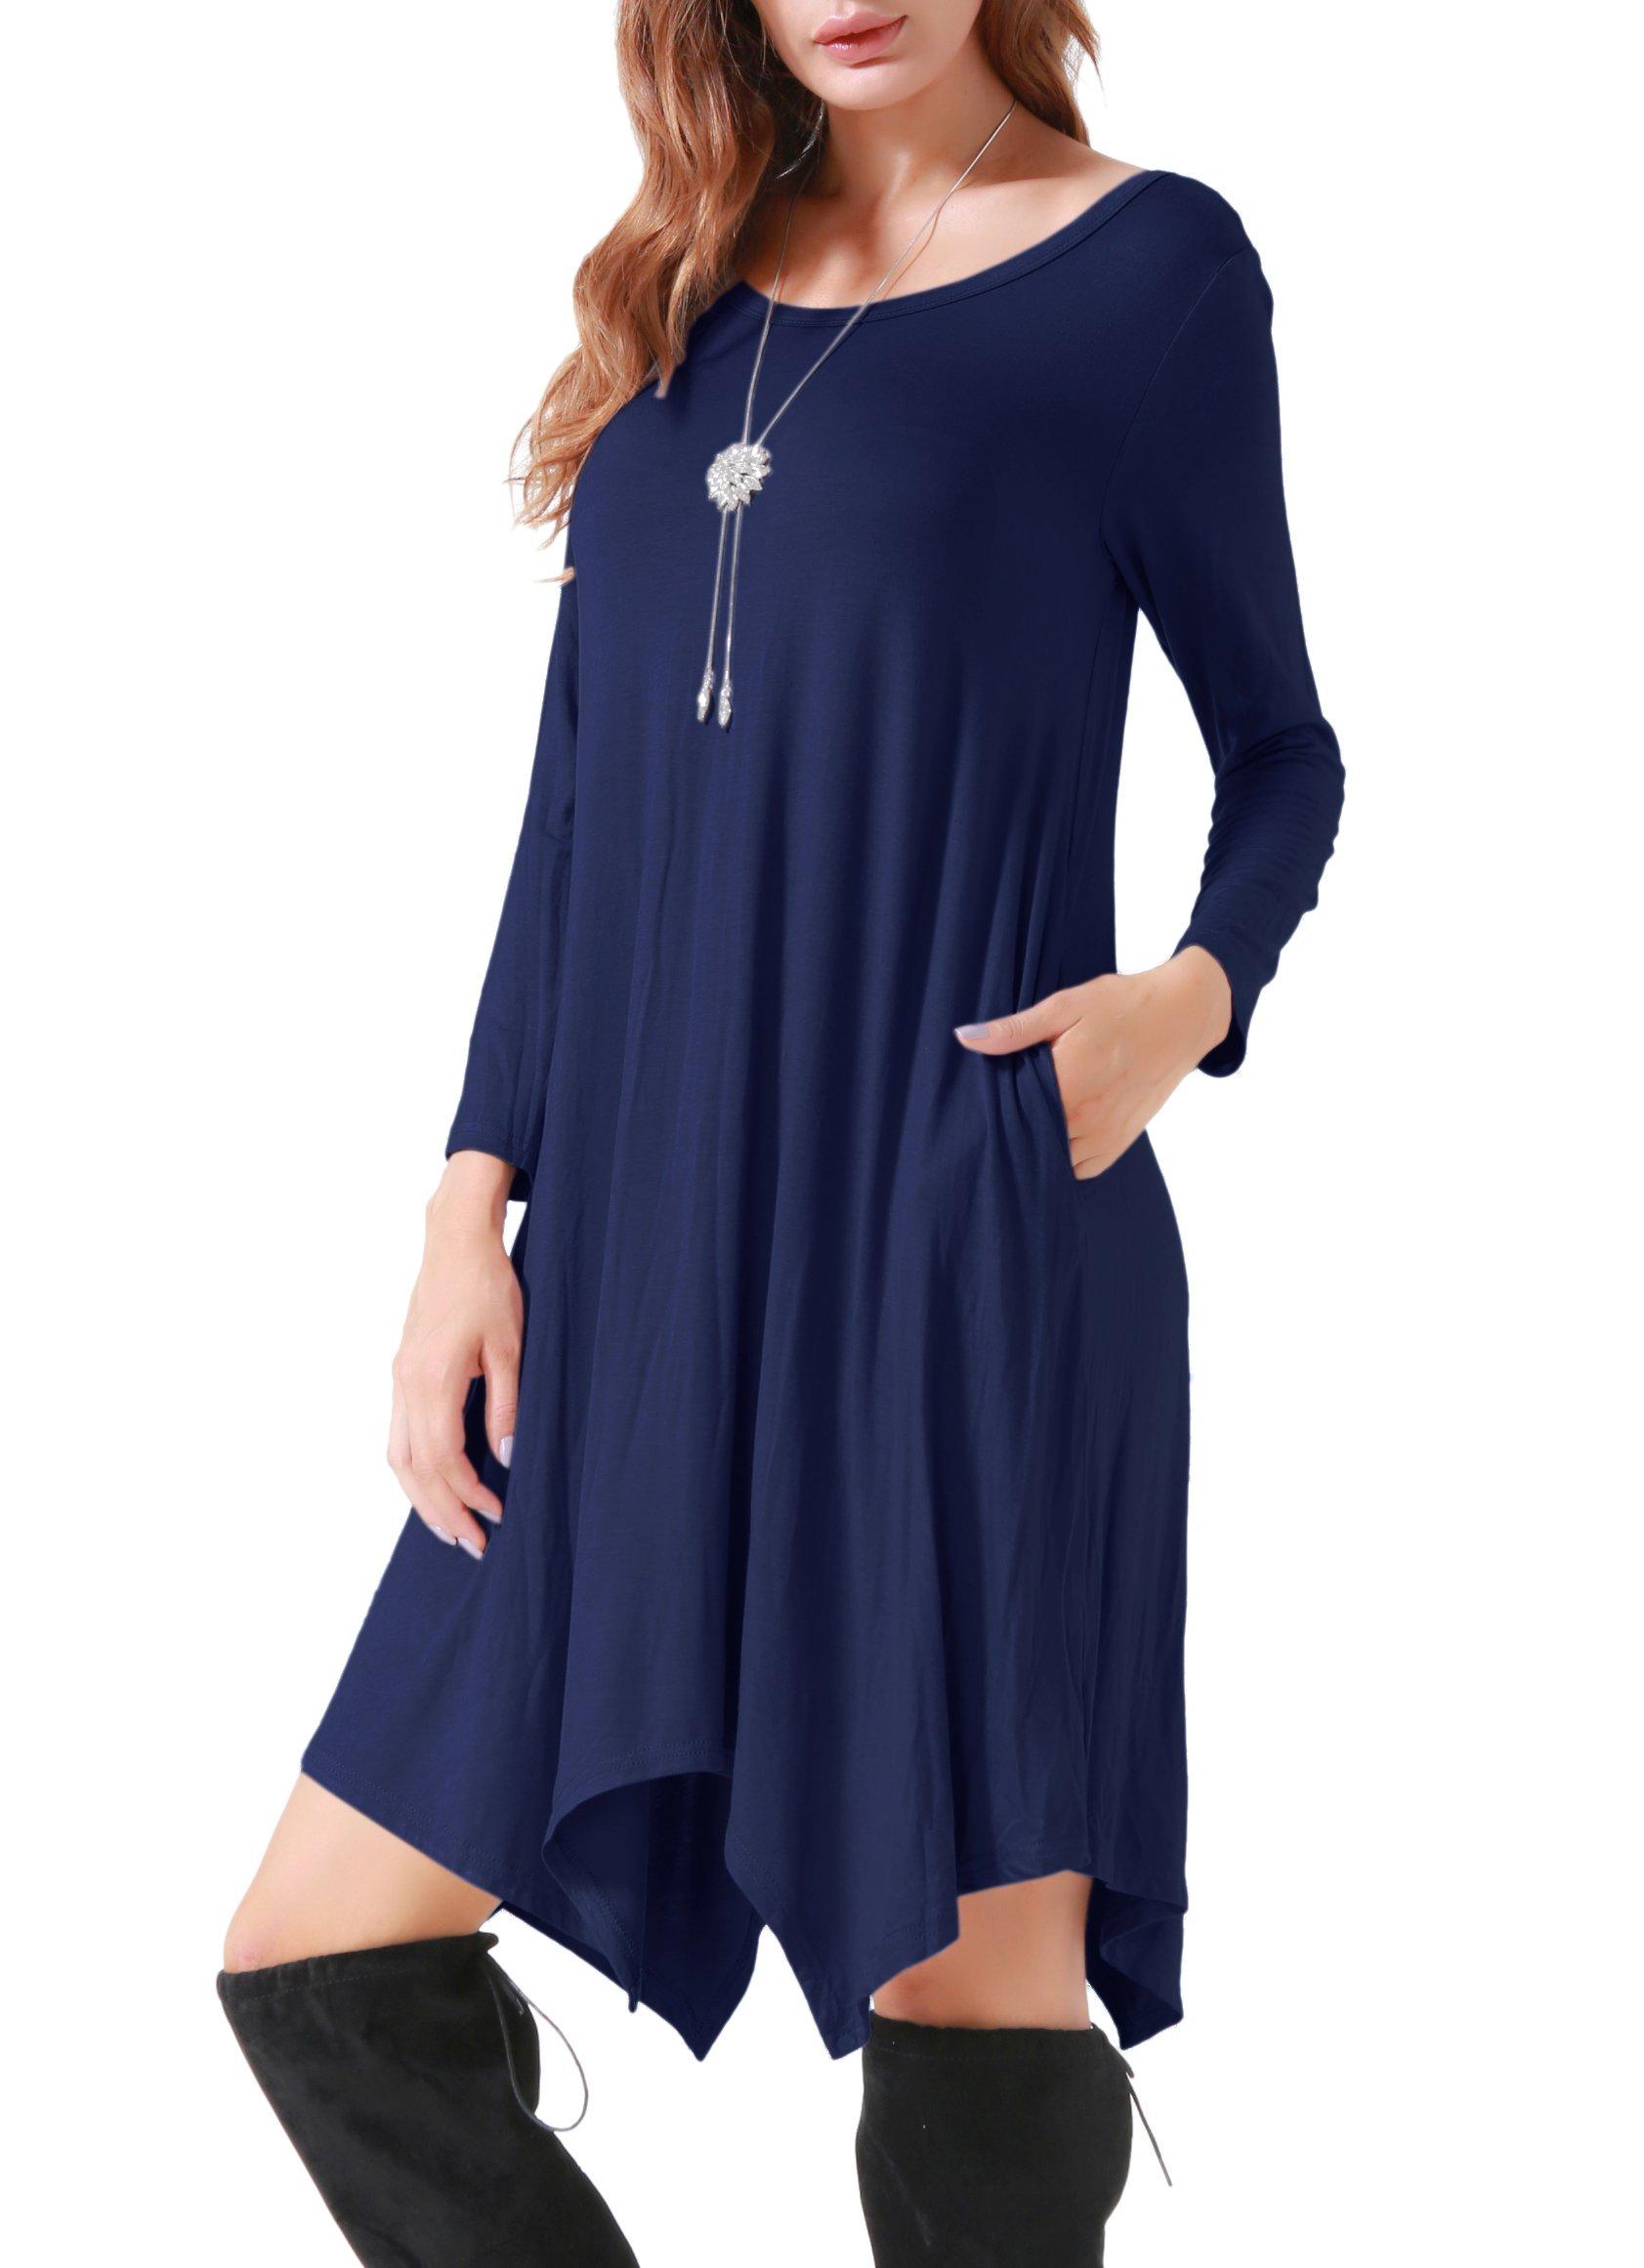 Invug Women Casual Loose Soft Crewneck Long Sleeve Pockets Swing T-shirt Dress Navy XL